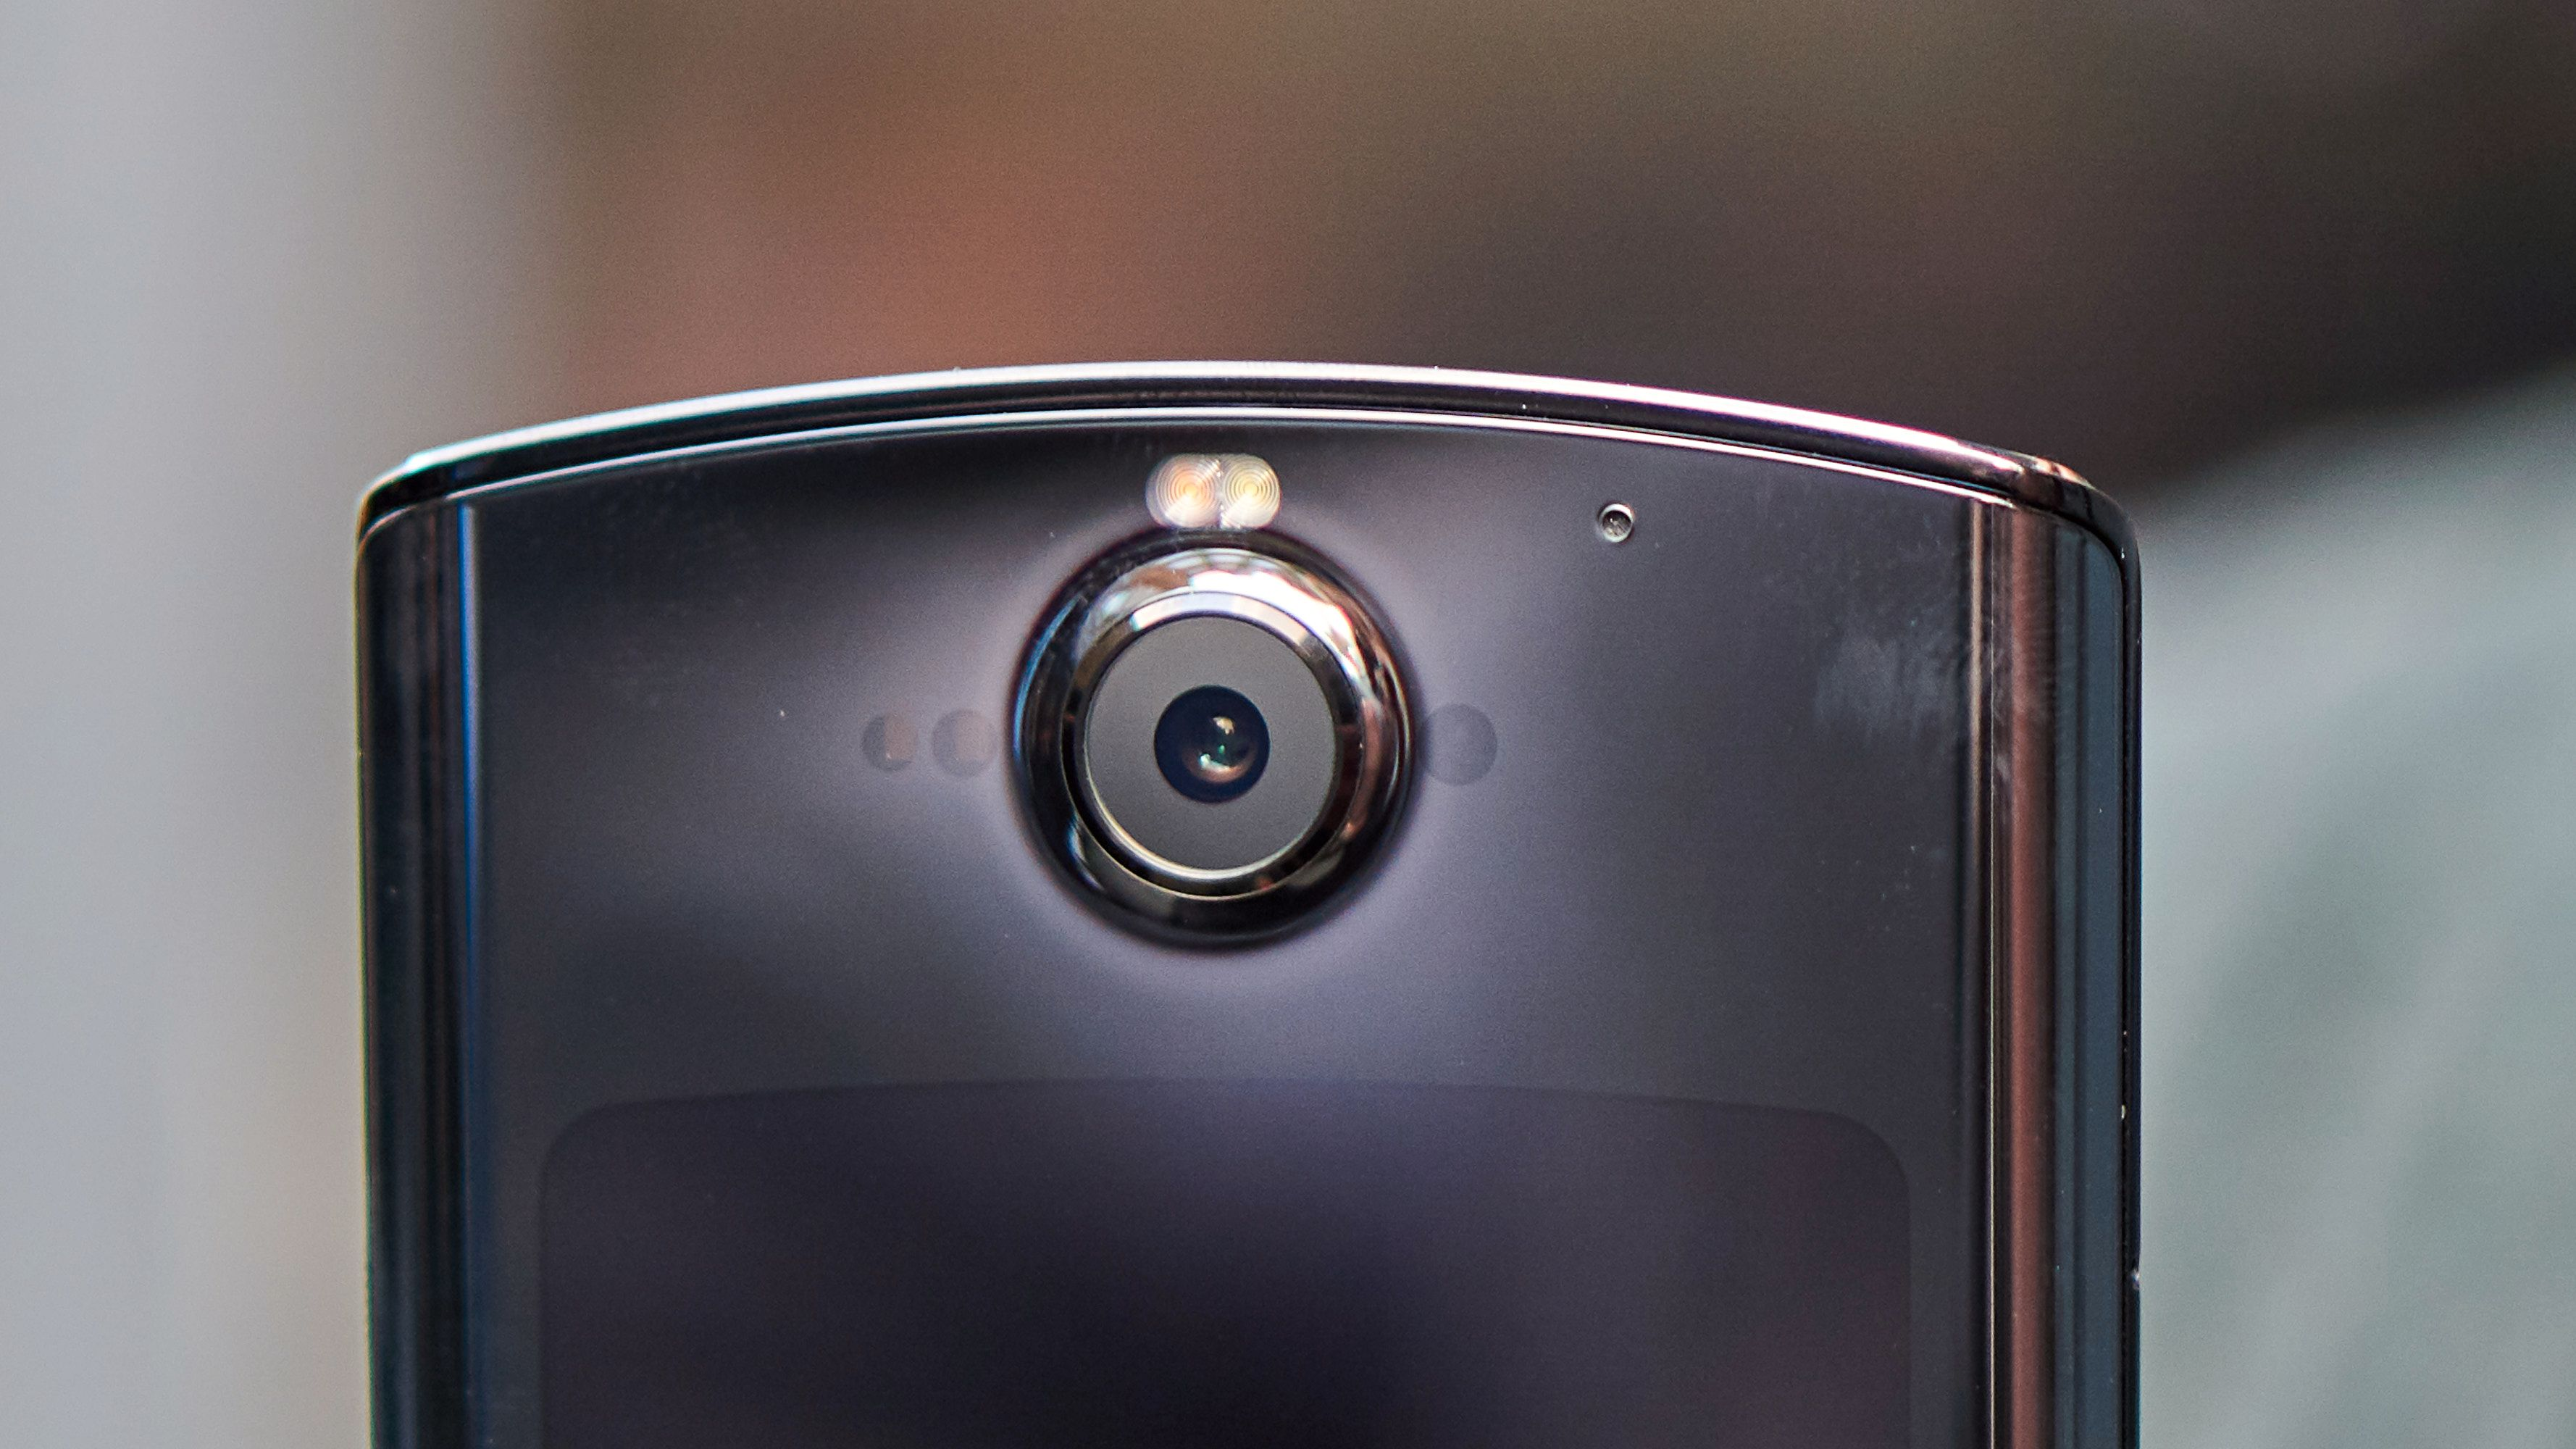 Hovedkameraet har også en Time of Flight-sensor skjult under glasset.